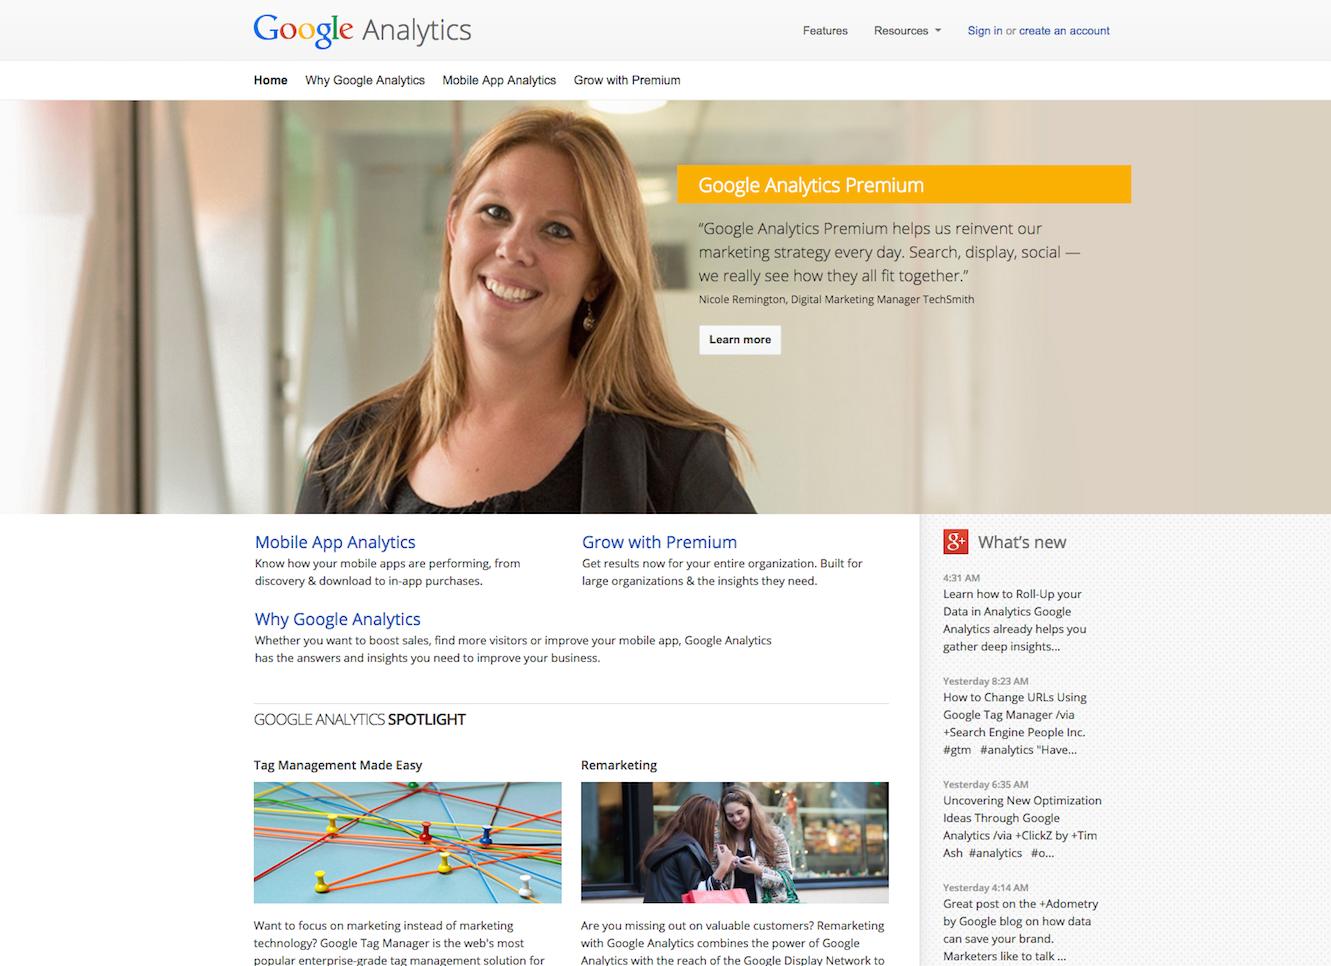 google analytics sigin page